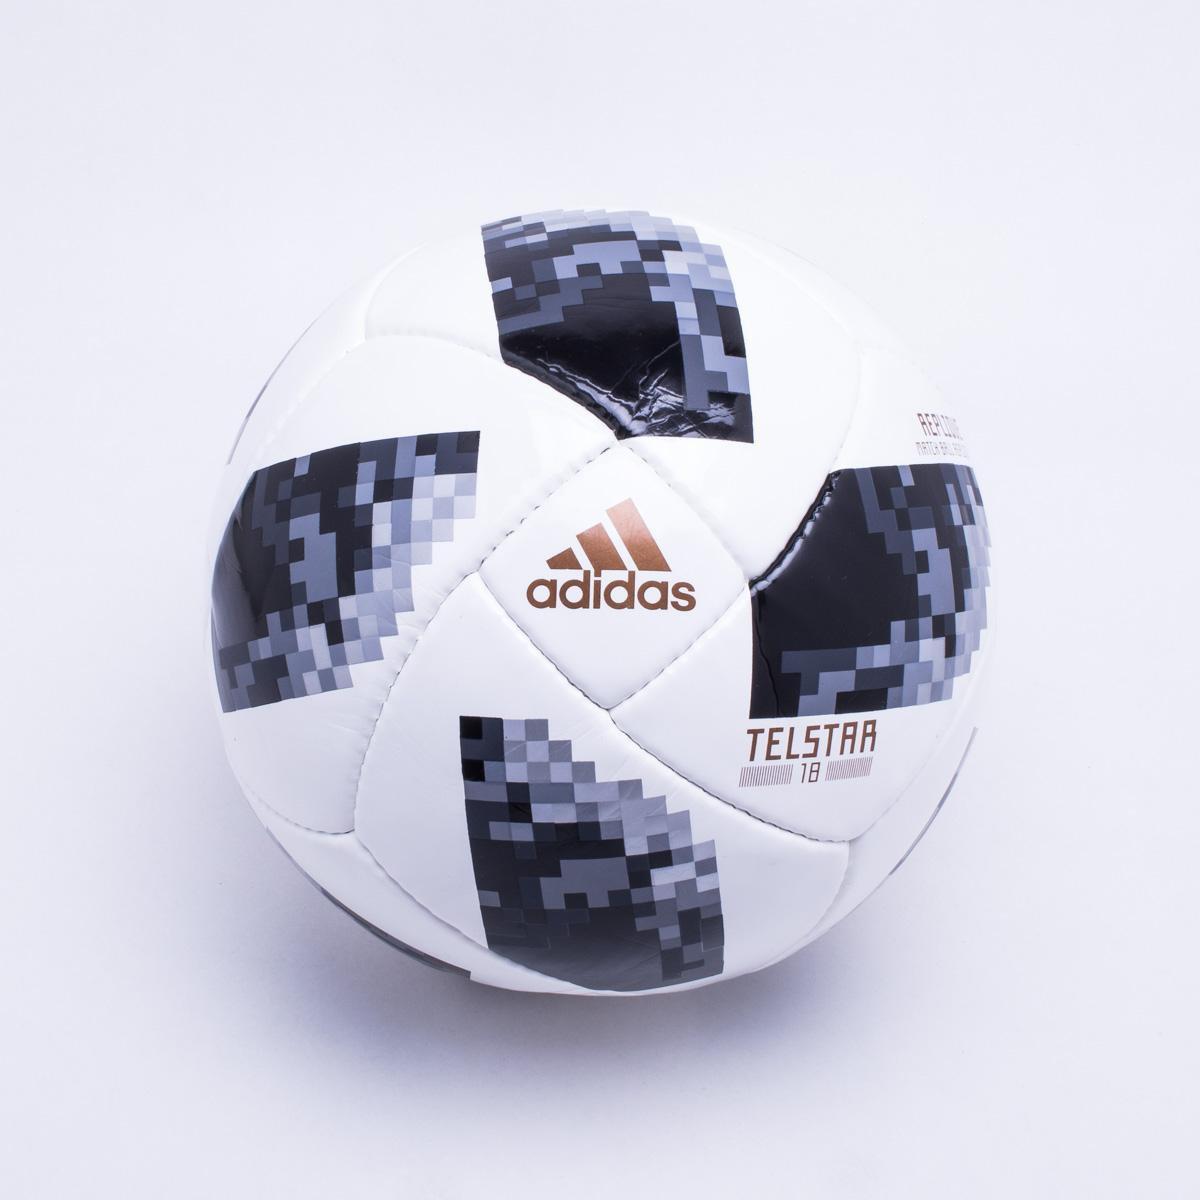 679788cf44490 Bola Futebol Campo Adidas Telstar 18 Copa do Mundo Replique FIFA - Branco -  Compre Agora